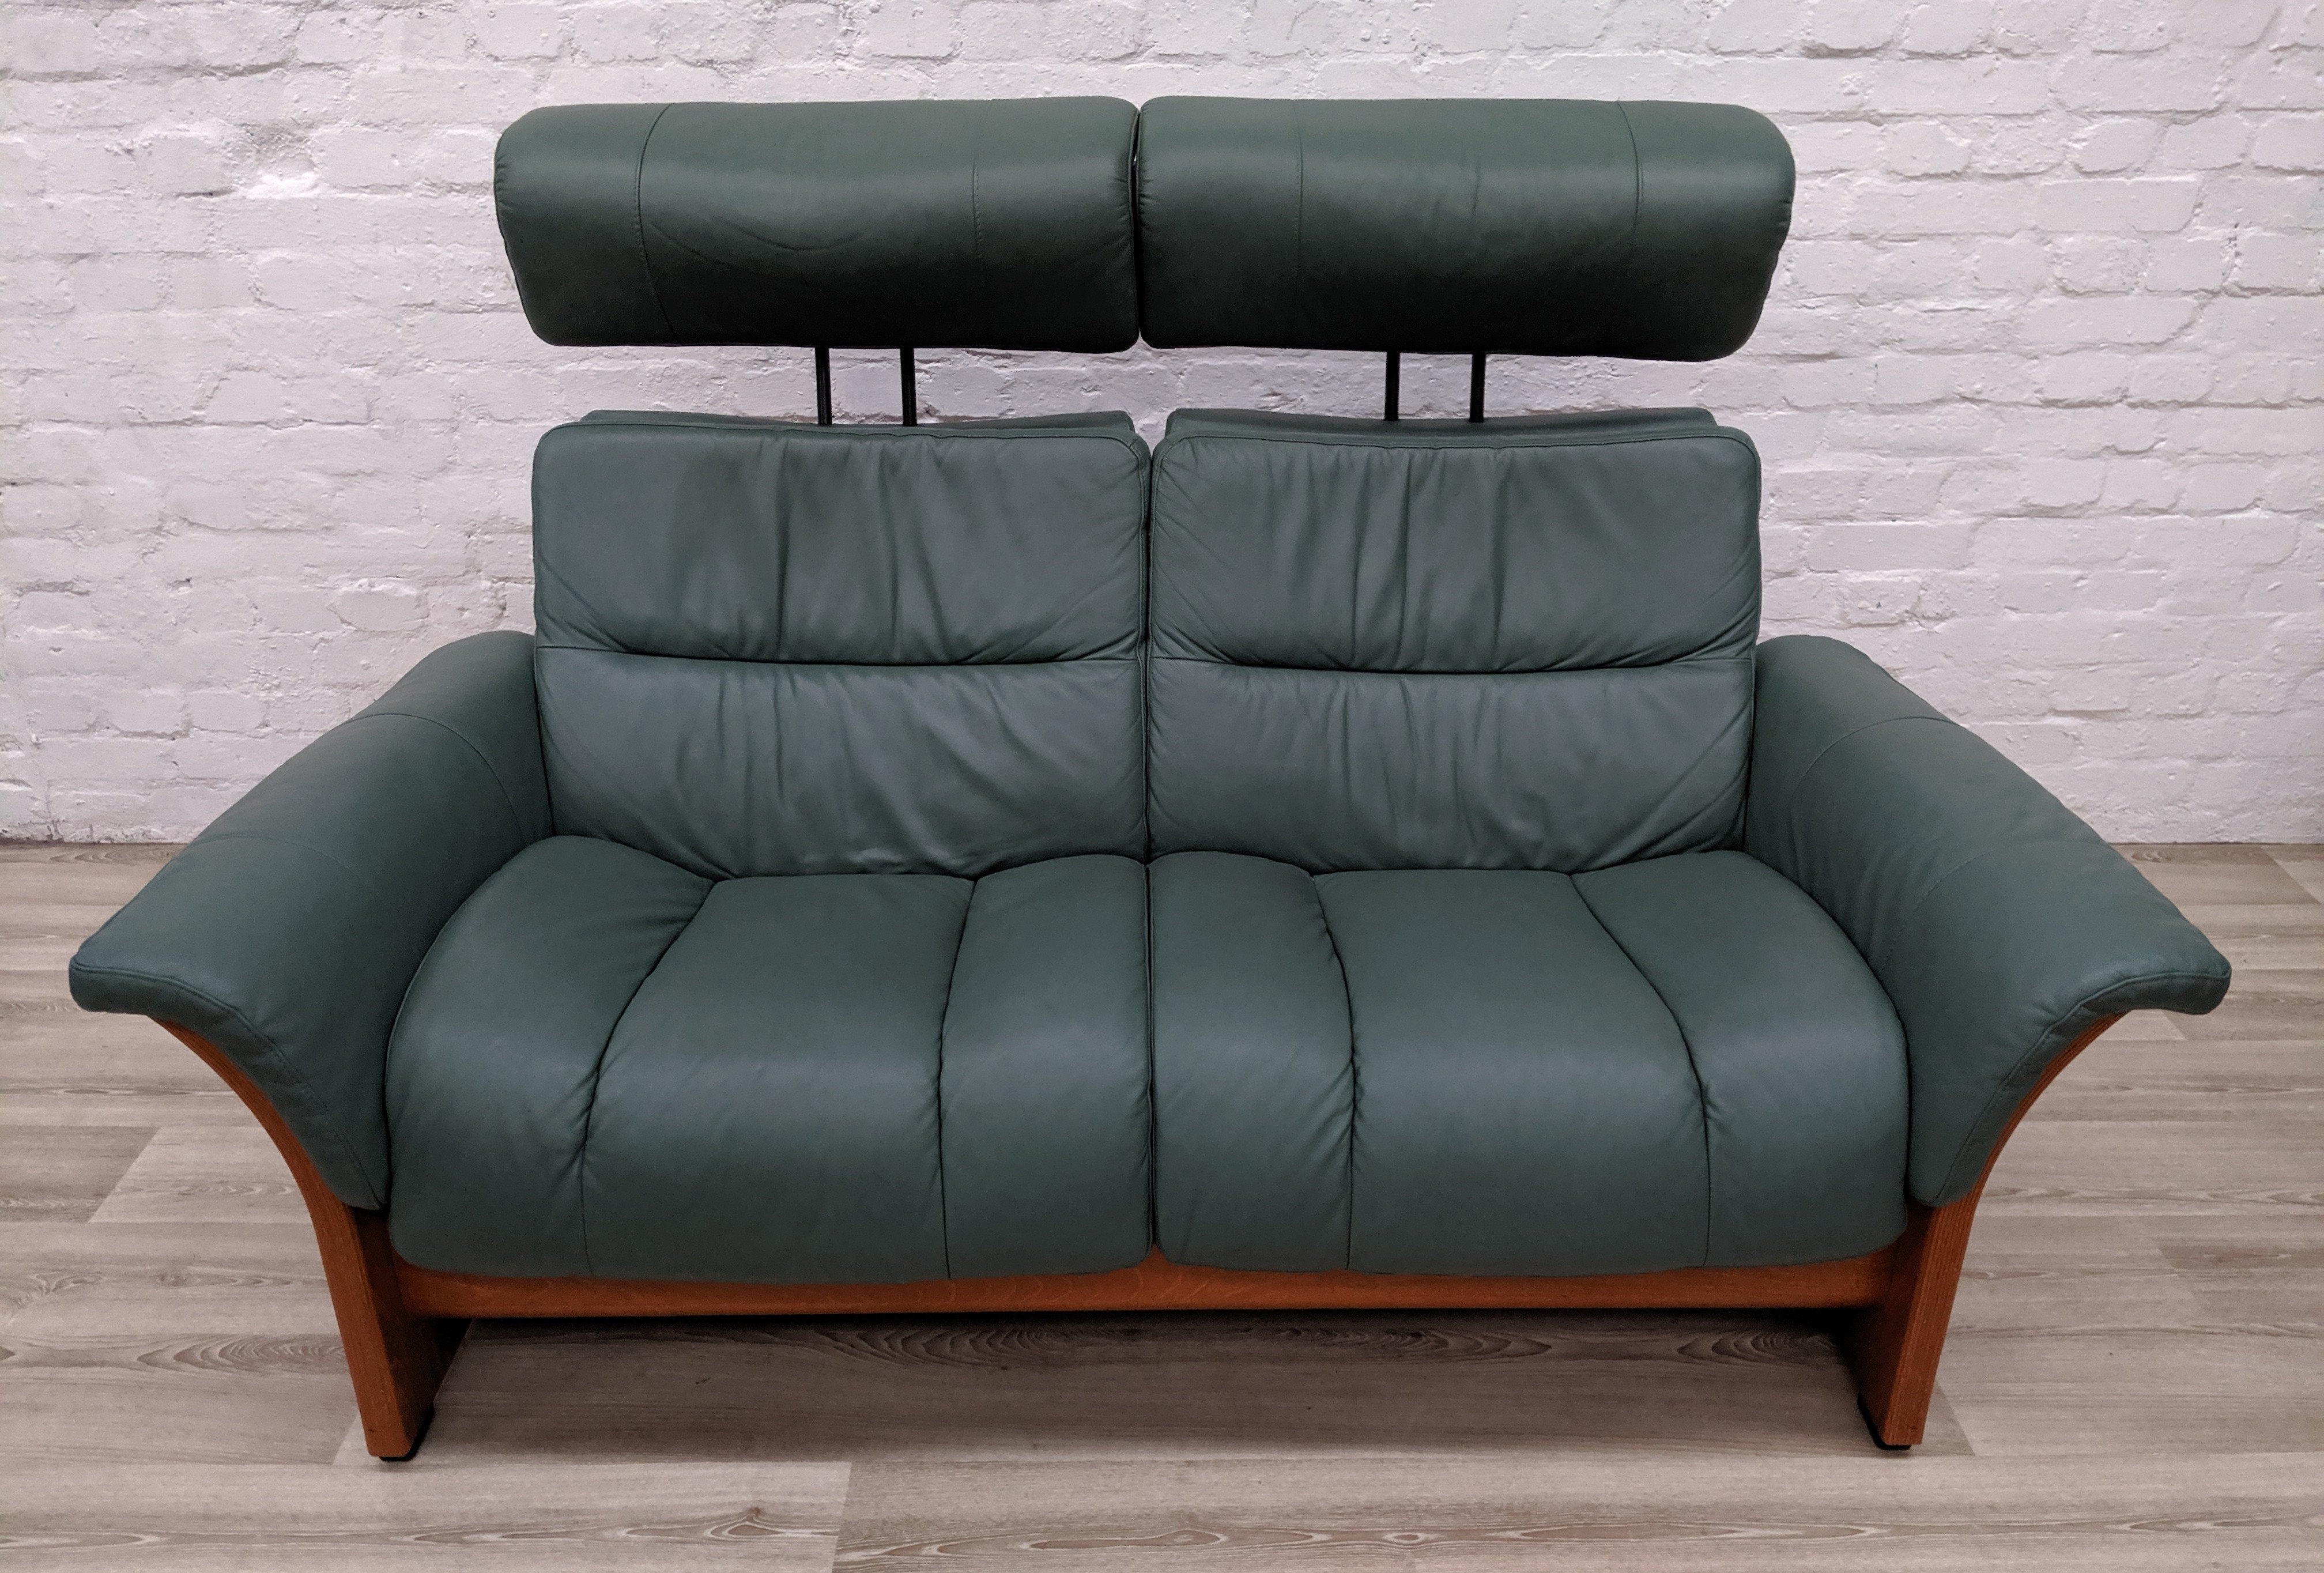 Ekornes Stressless Two Seater Reclining Sofa The Timeless Furnitu